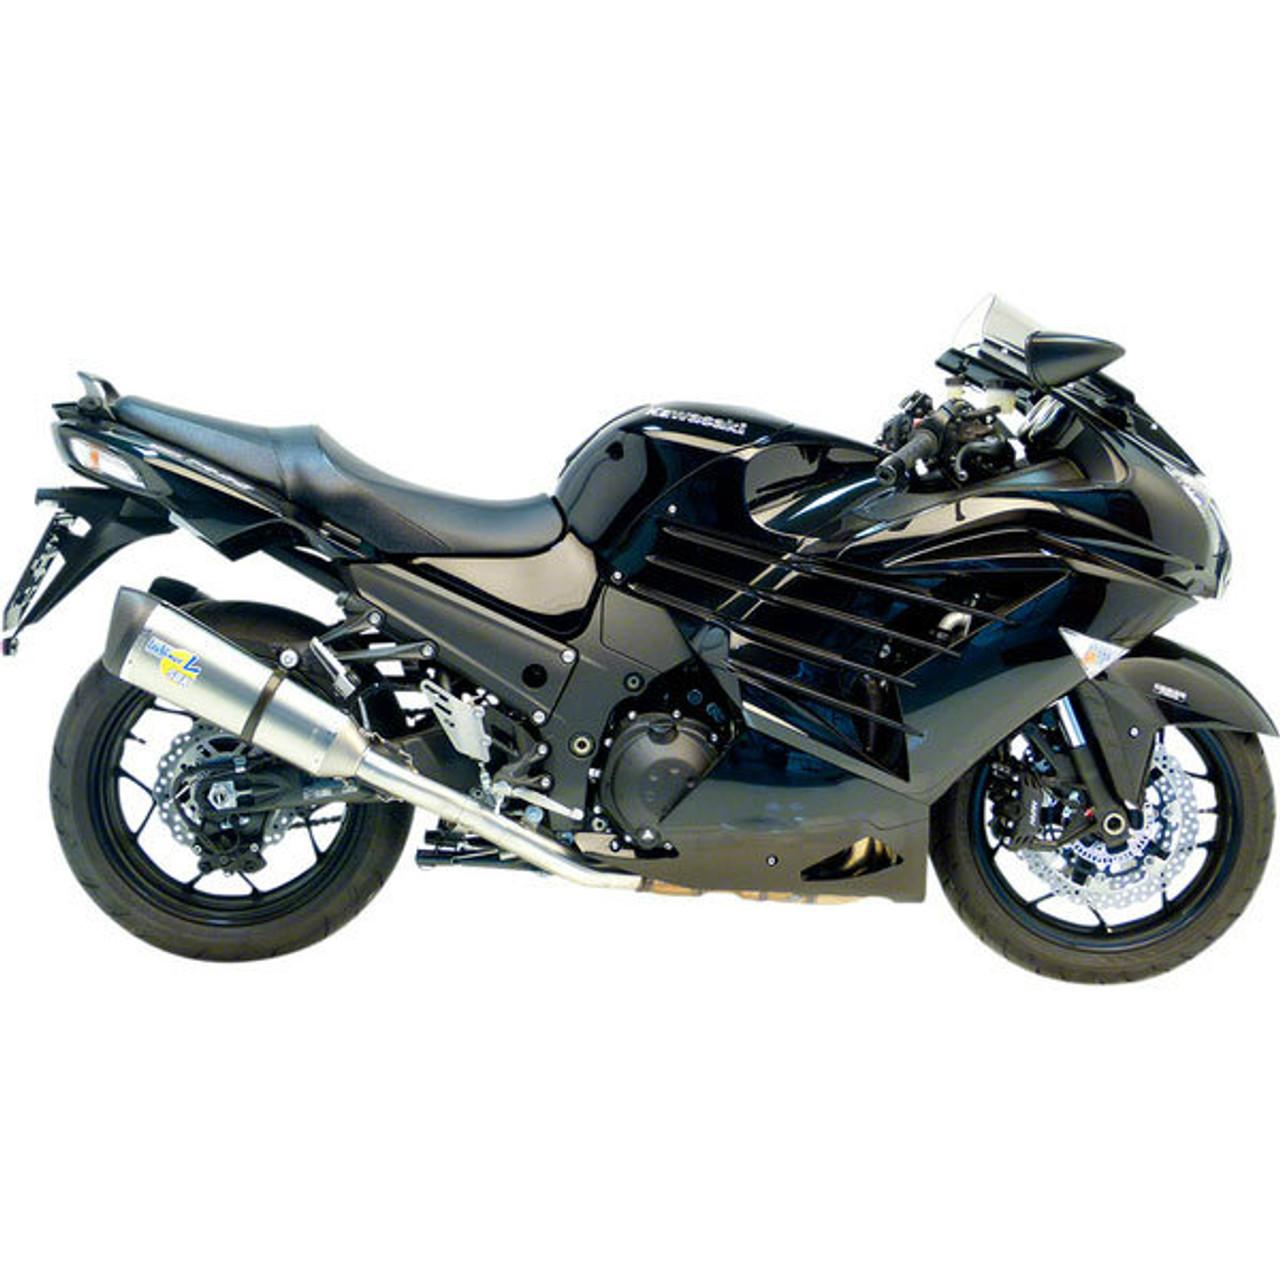 leo vince kawasaki zx 14r 12 19 titanium standard mount evo ii factory r slip on exhaust